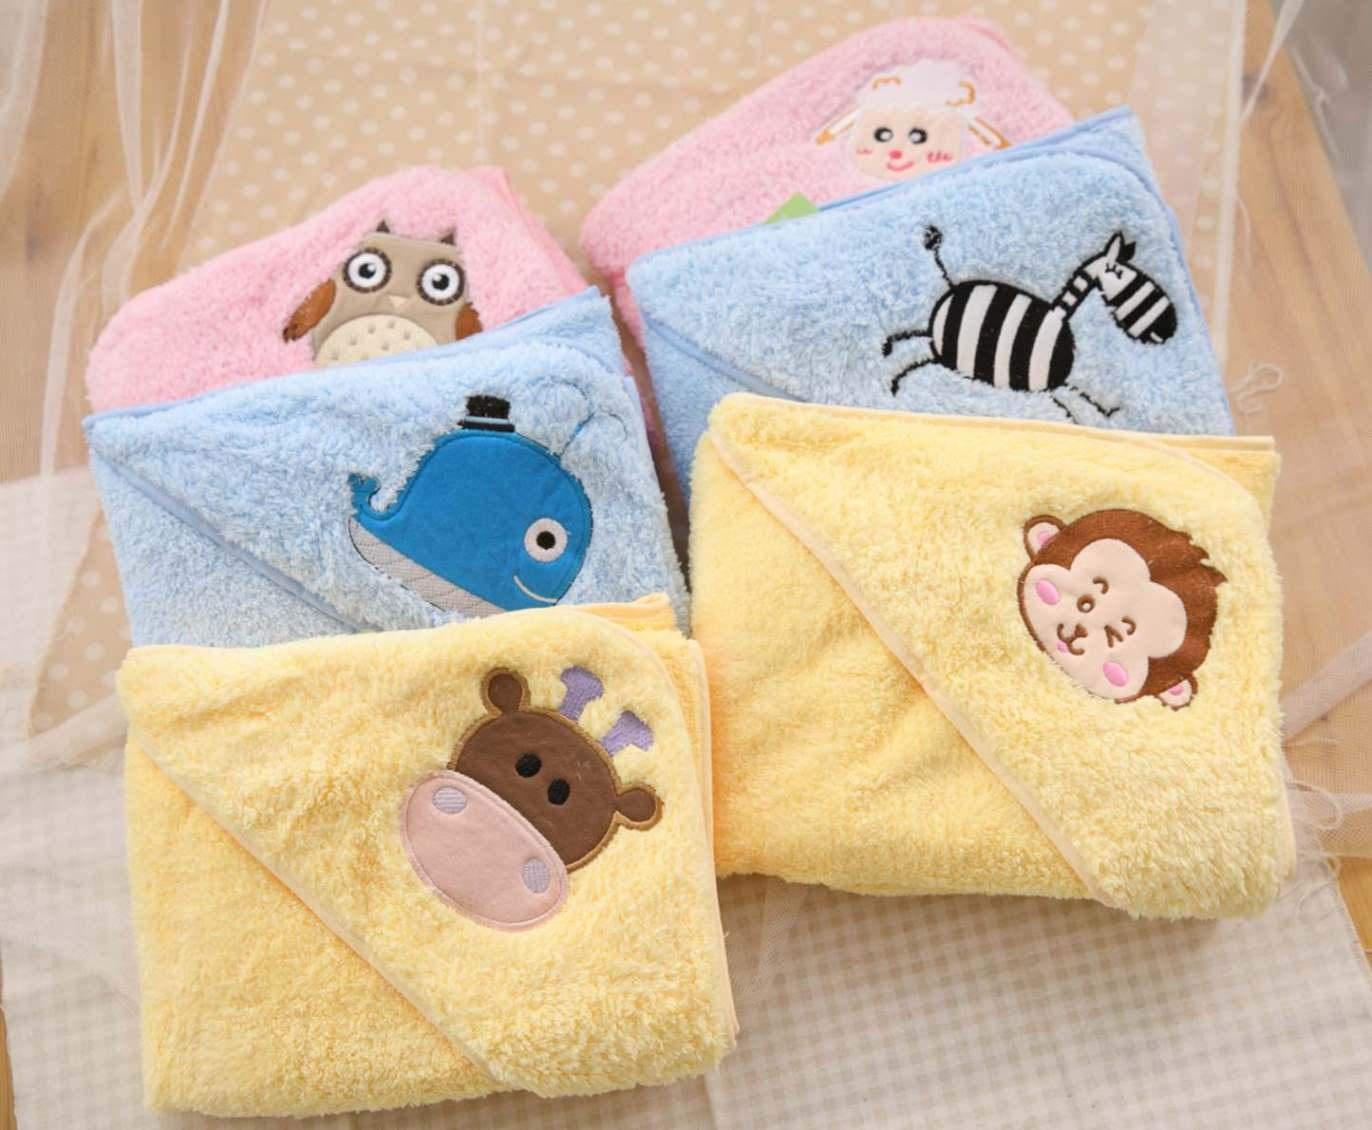 【NikoKids】無棉絮嬰兒專用超細纖維包巾/浴巾/保暖被 MIT 【75*75cm】【買一送一圖案隨機】